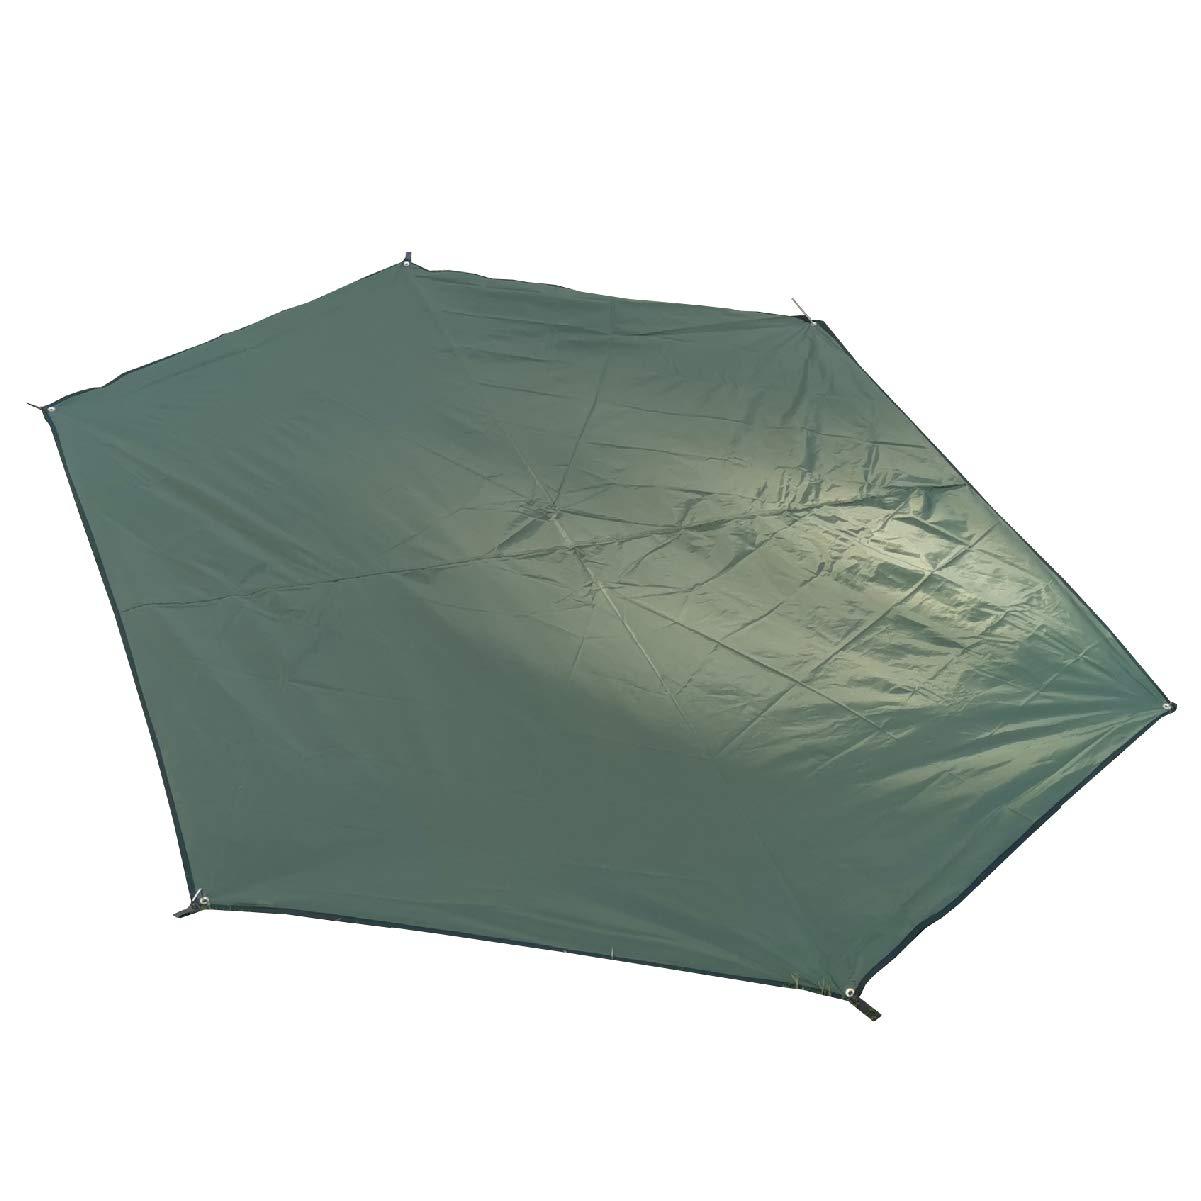 TRIWONDER Waterproof Hexagonal Hammock Rain Fly Tent Tarp Footprint Ground Cloth Camping Shelter Sunshade Beach Picnic Mat for Hiking Picnic (Dark Green - XL - Tarp Only) by TRIWONDER